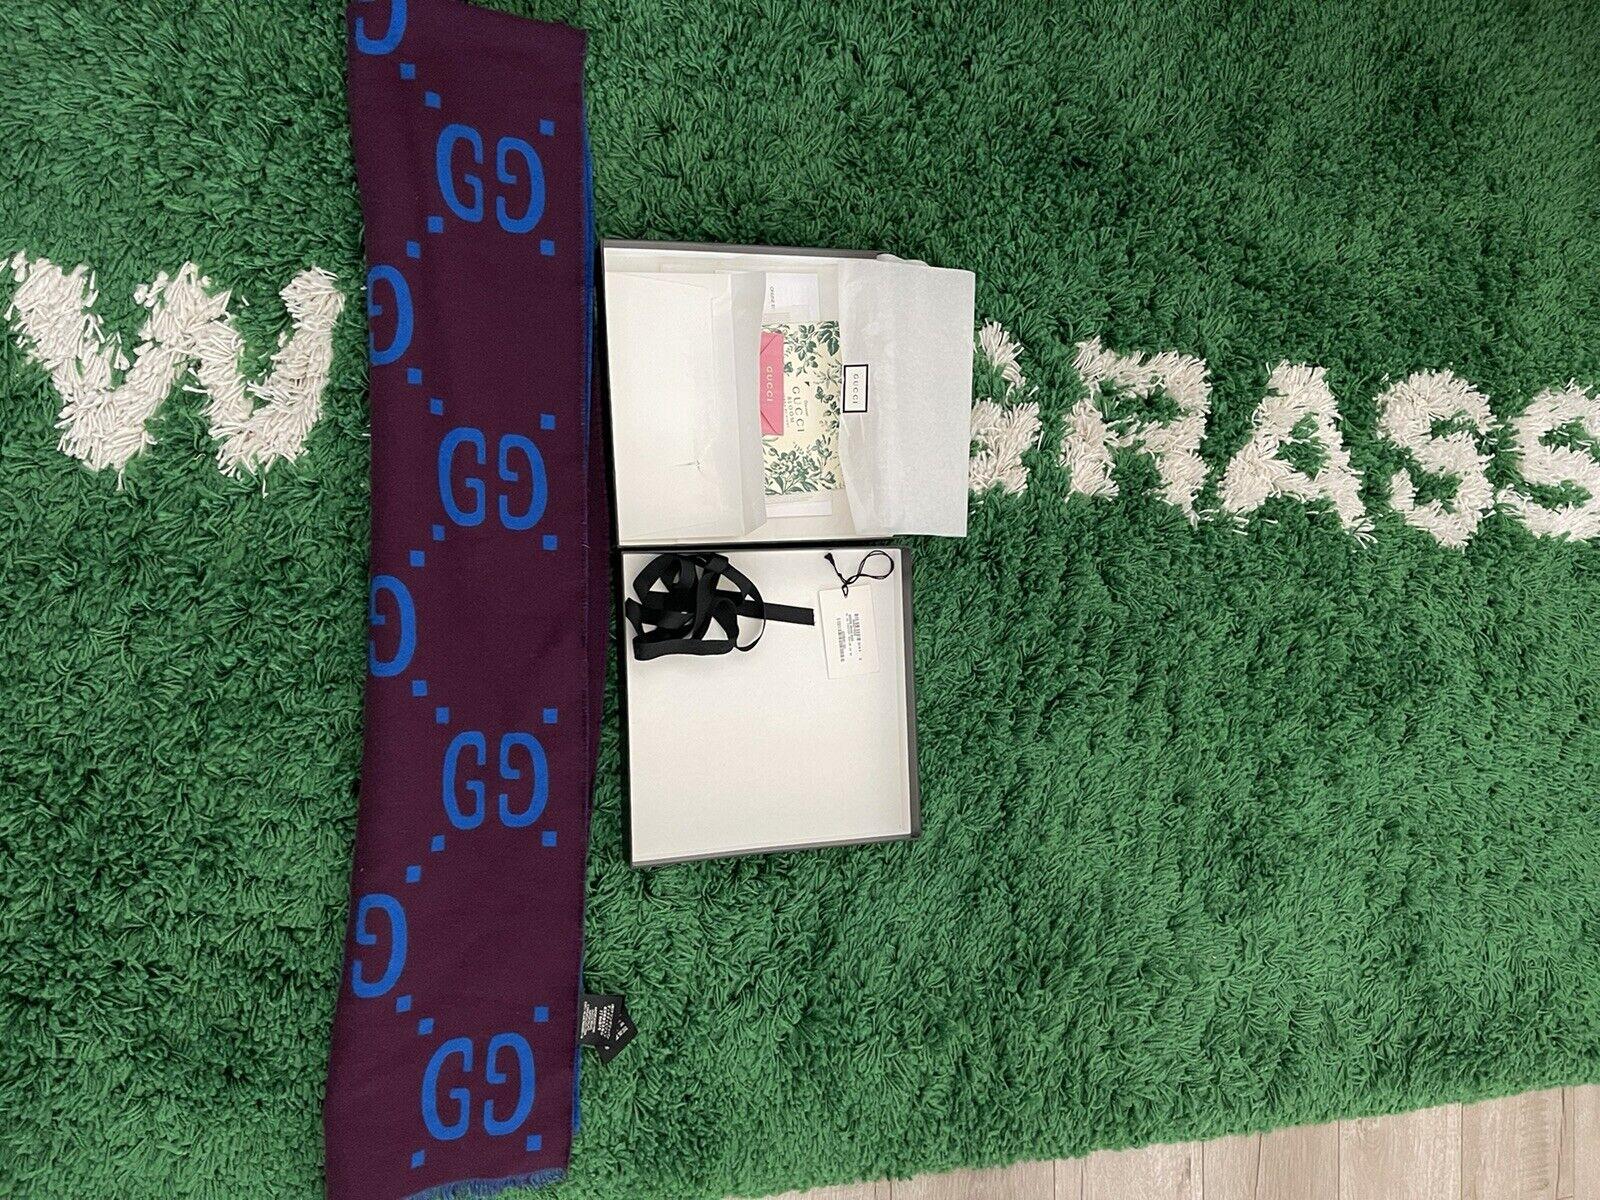 Gucci GG jacquard wool silk scarf - image 6